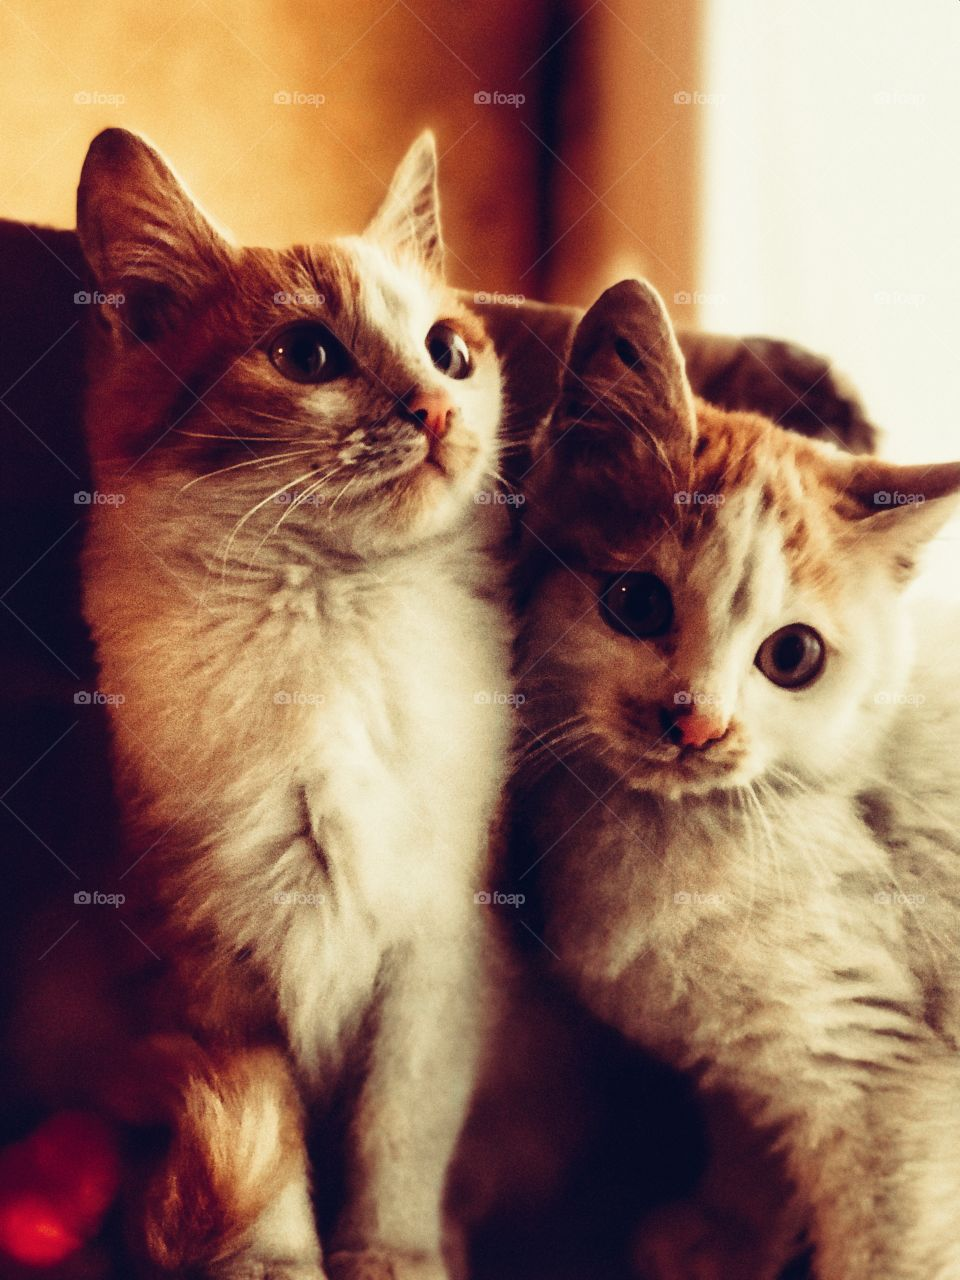 little furs 😻😻